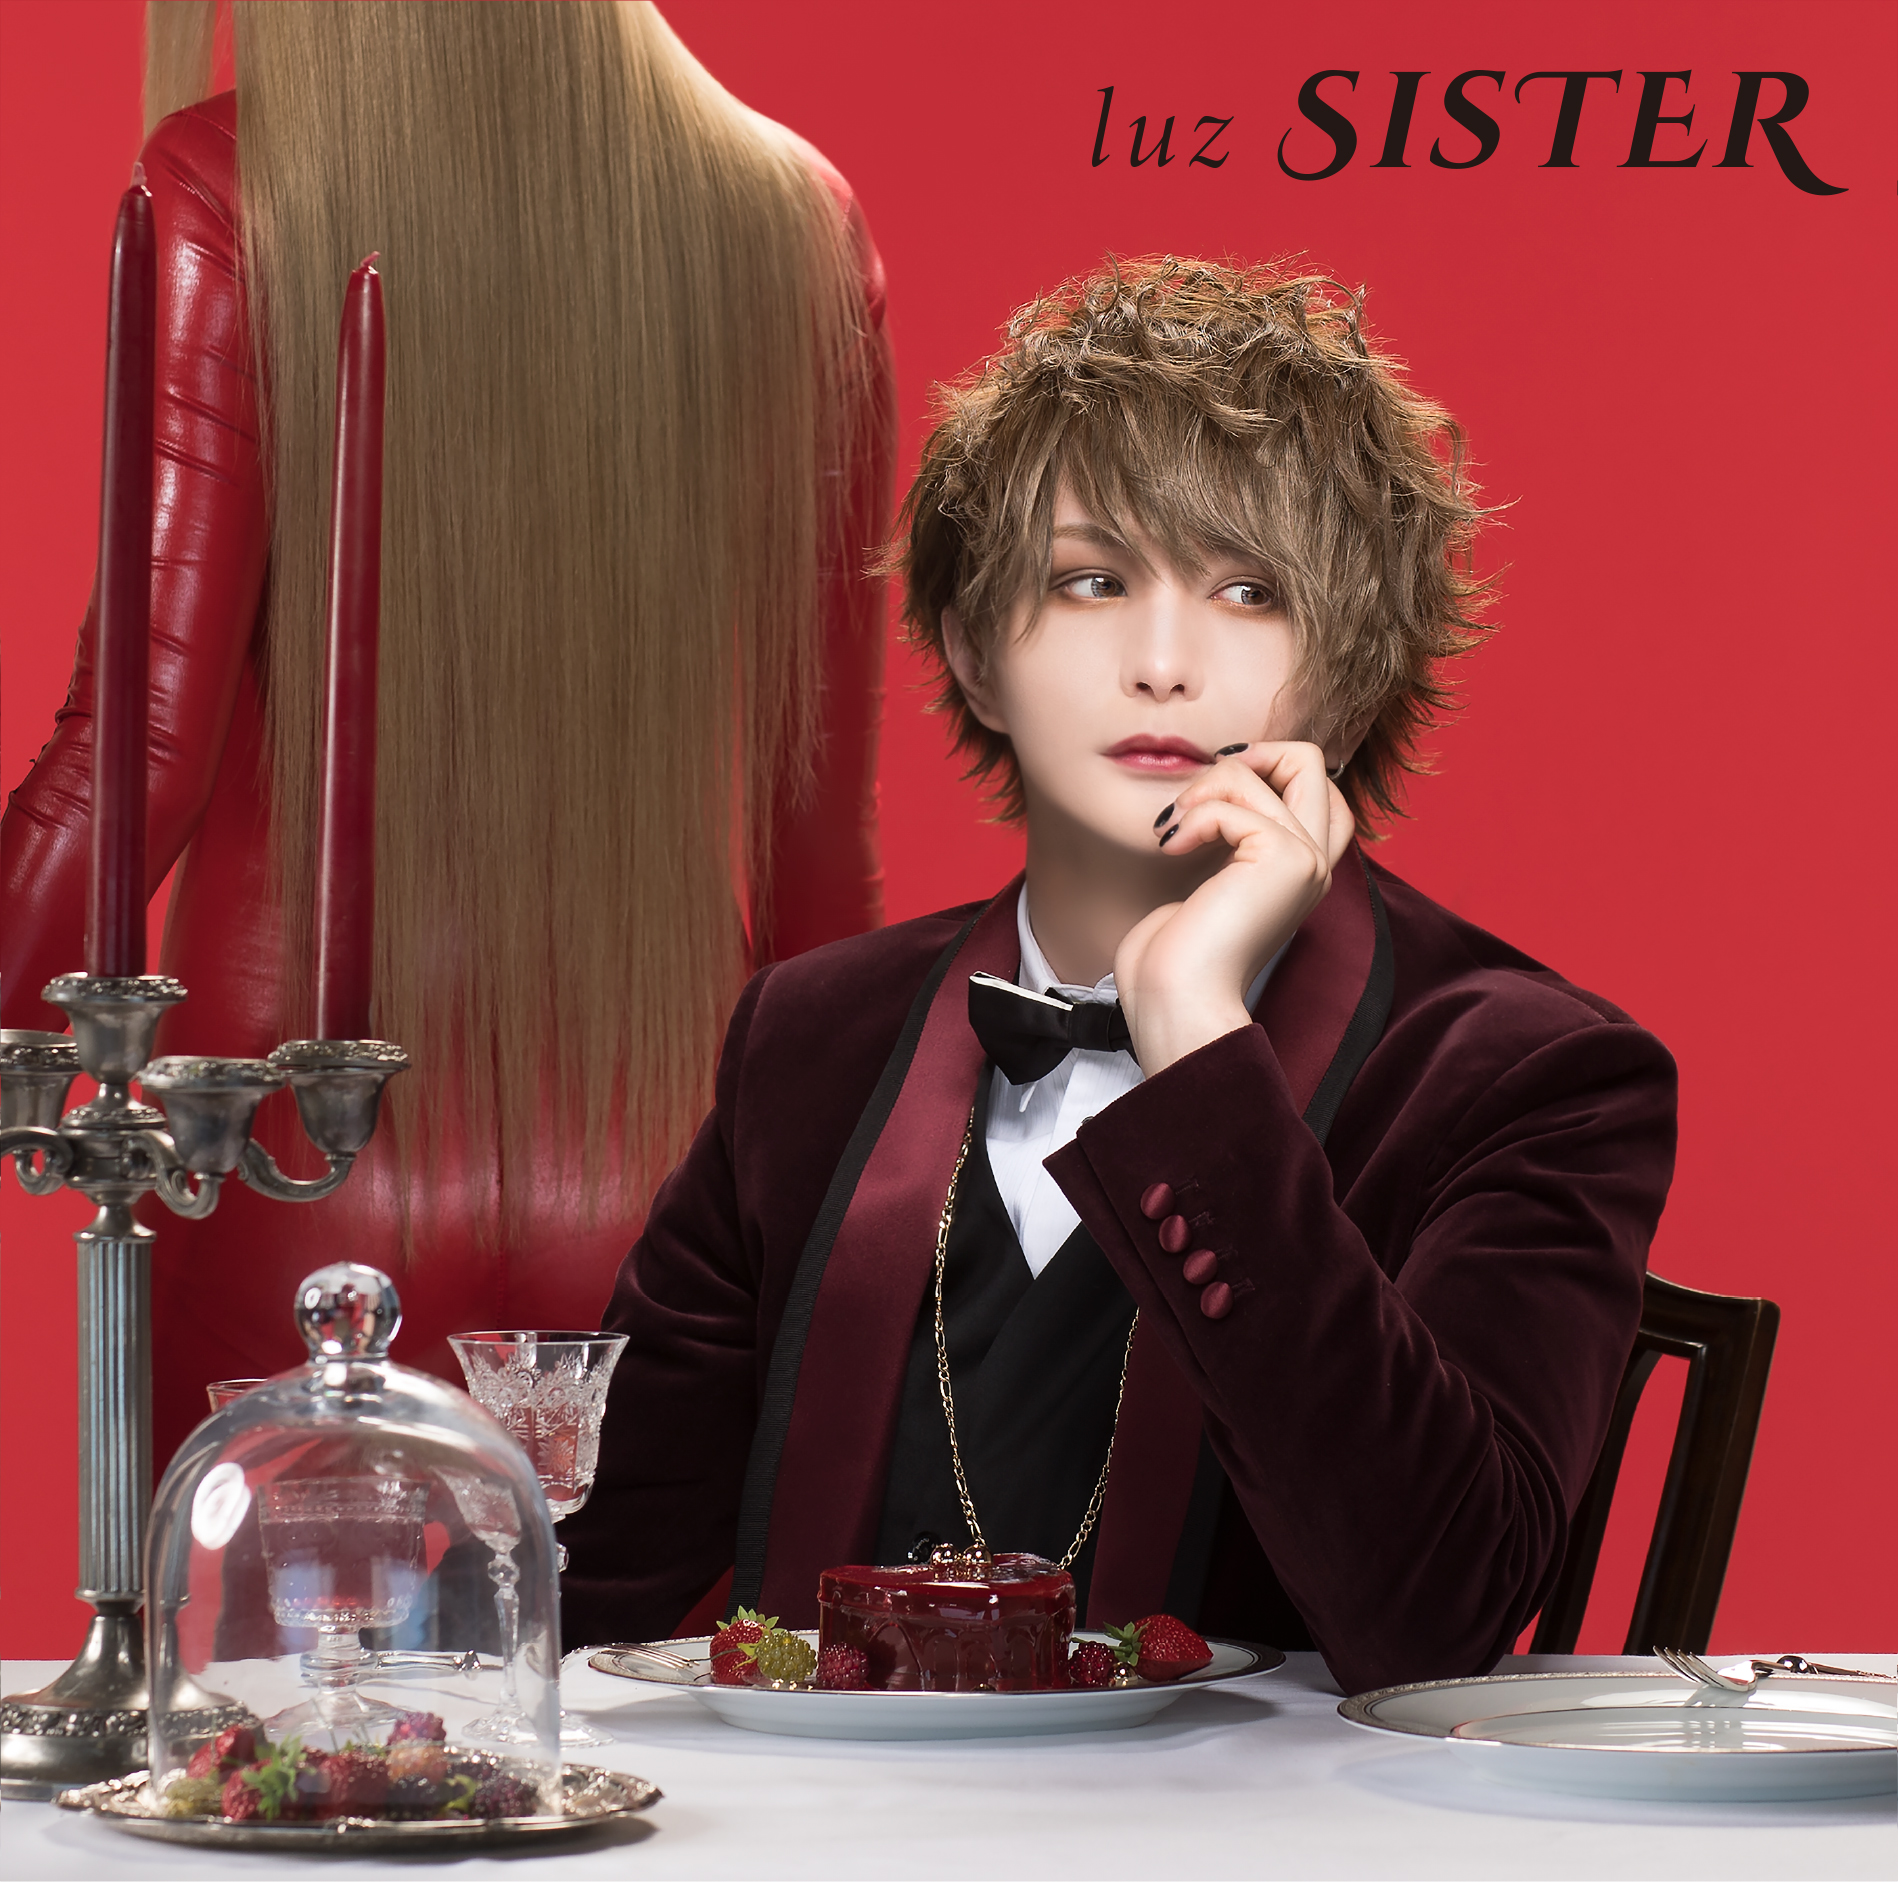 sister_luz_初回限定盤_fix